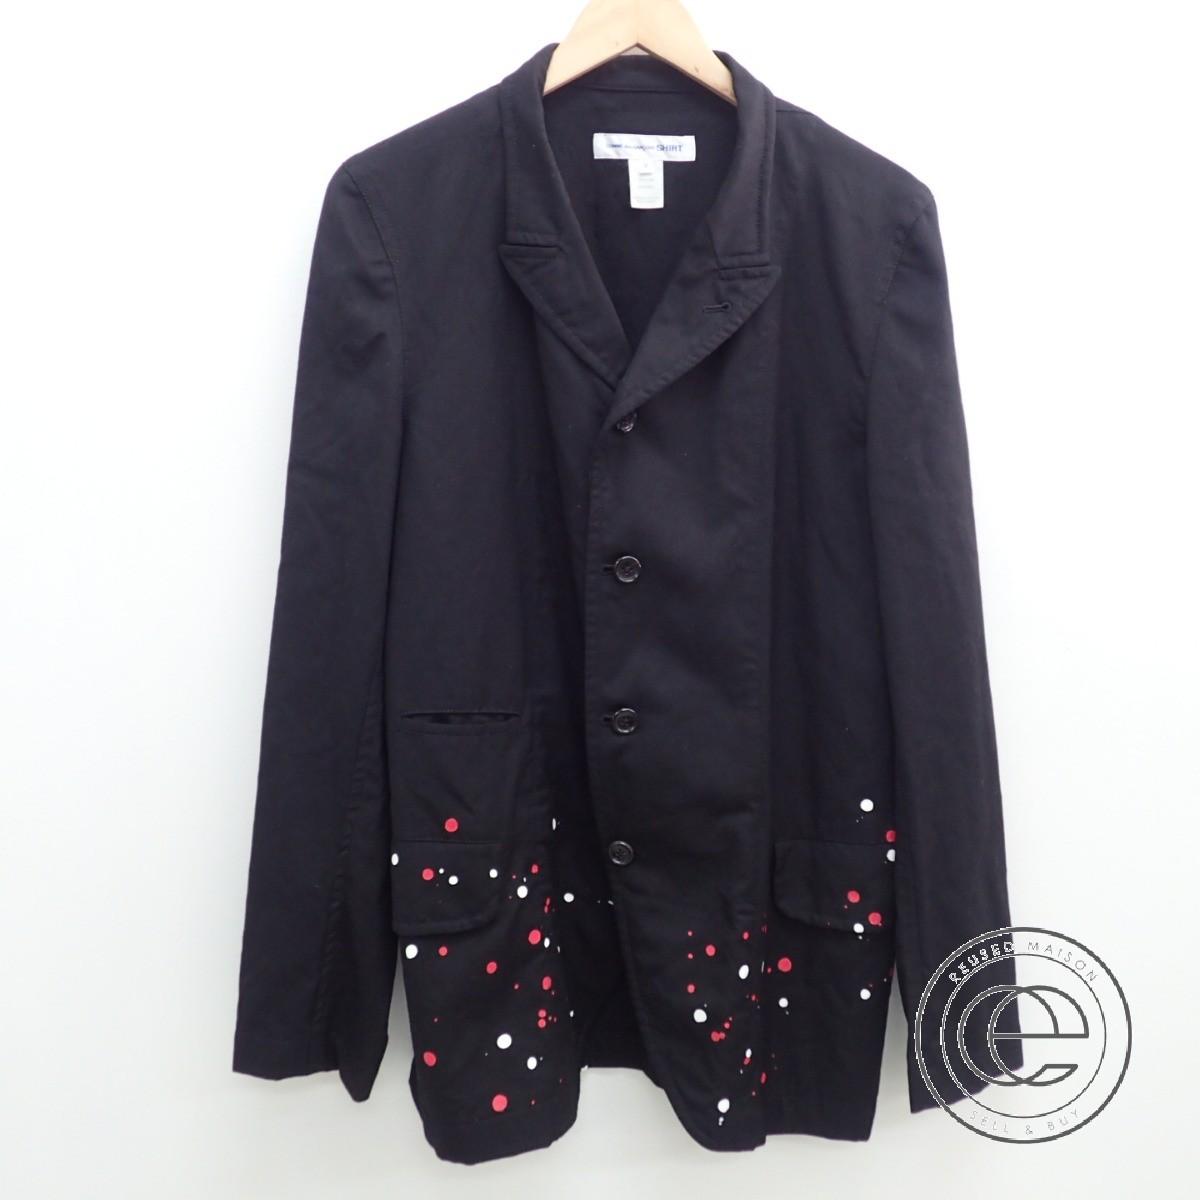 COMME des GARCONS GARCONS GARCONS SHIRT コムデギャルソンシャツ W23168 paint splatter blazer ペイント加工ジャケットM ブラック メンズ 【中古】 838